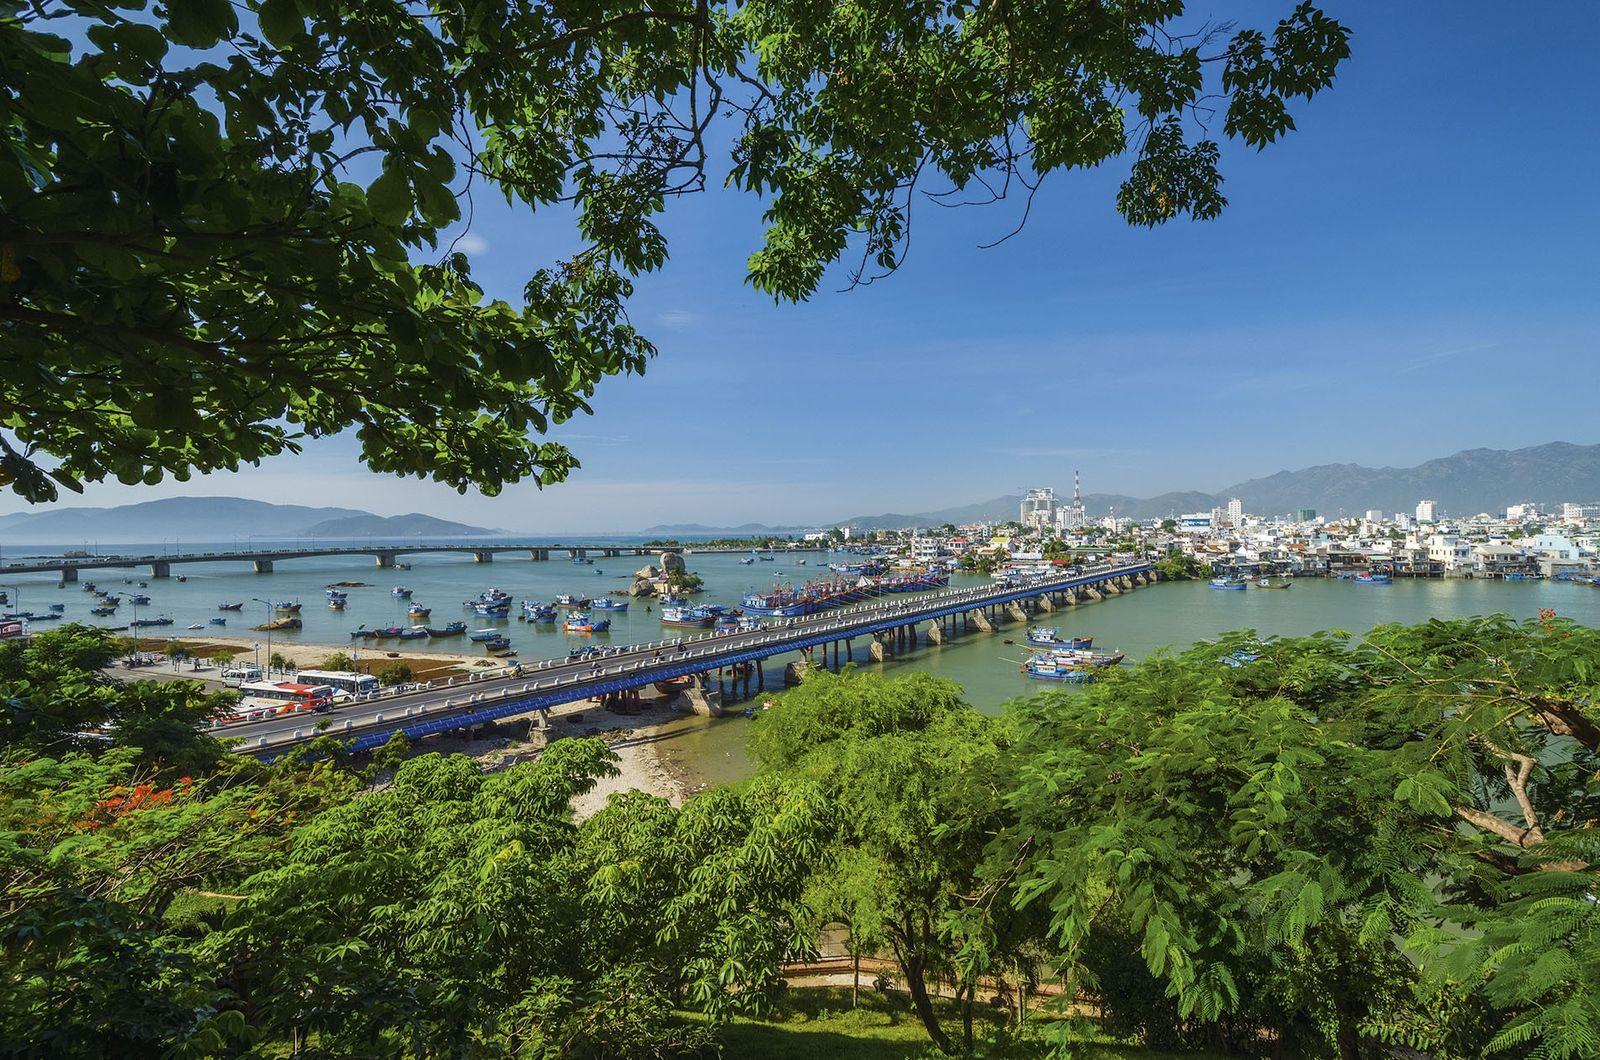 Panoramic View of Nha Trang